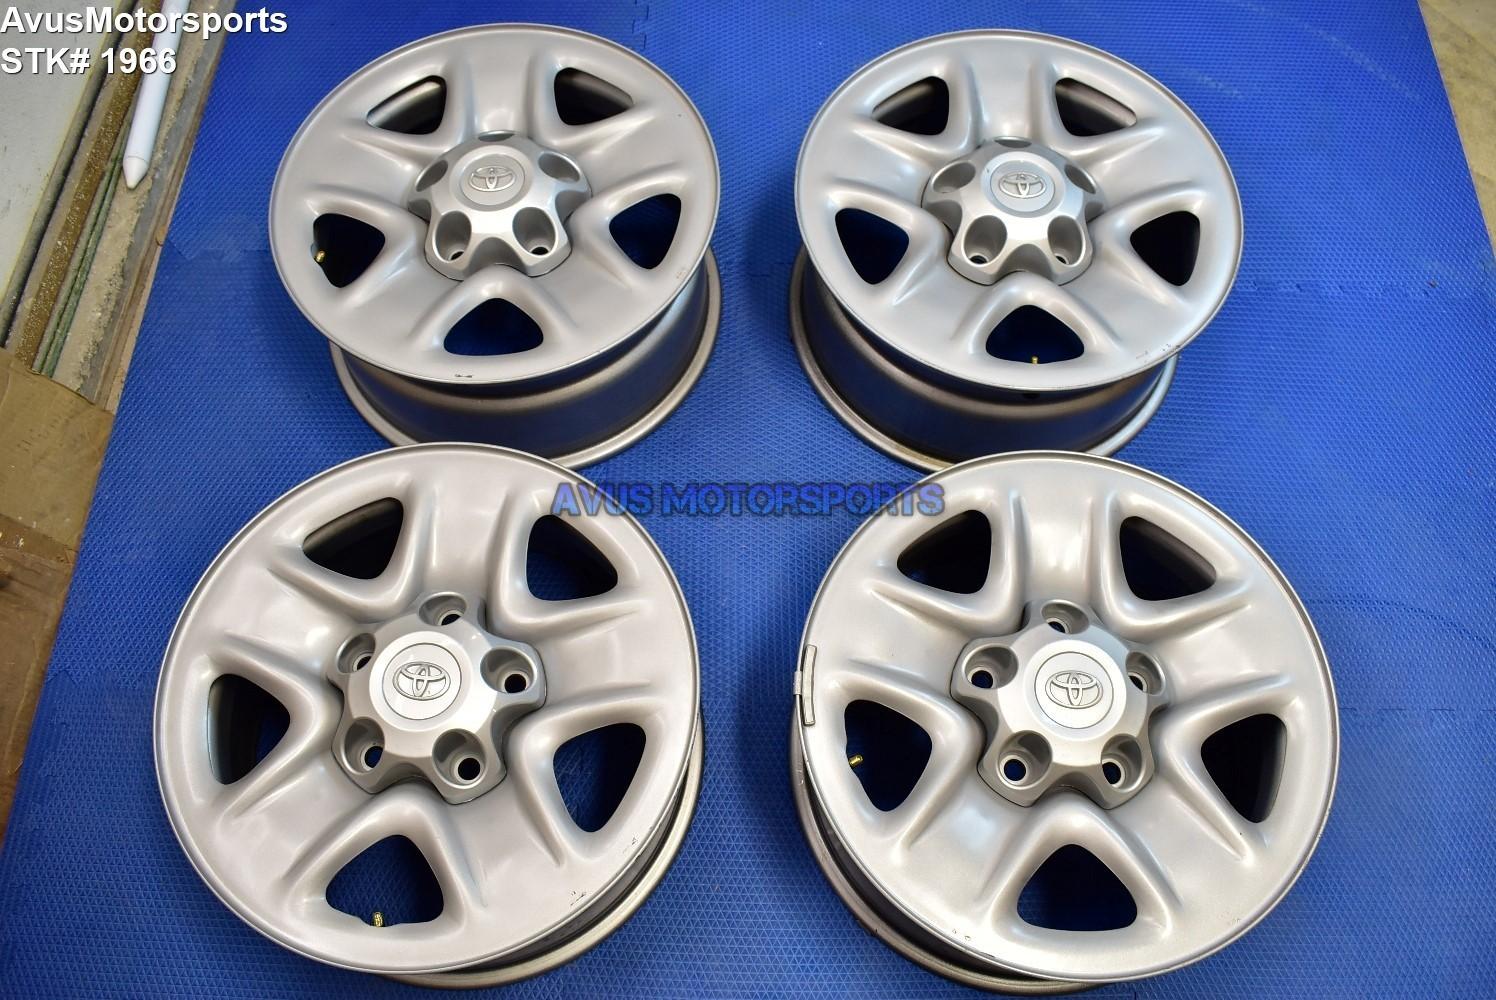 "18"" Toyota Tundra OEM Factory STEEL Wheels Sequoia Land Cruiser Lx570 2018 17"